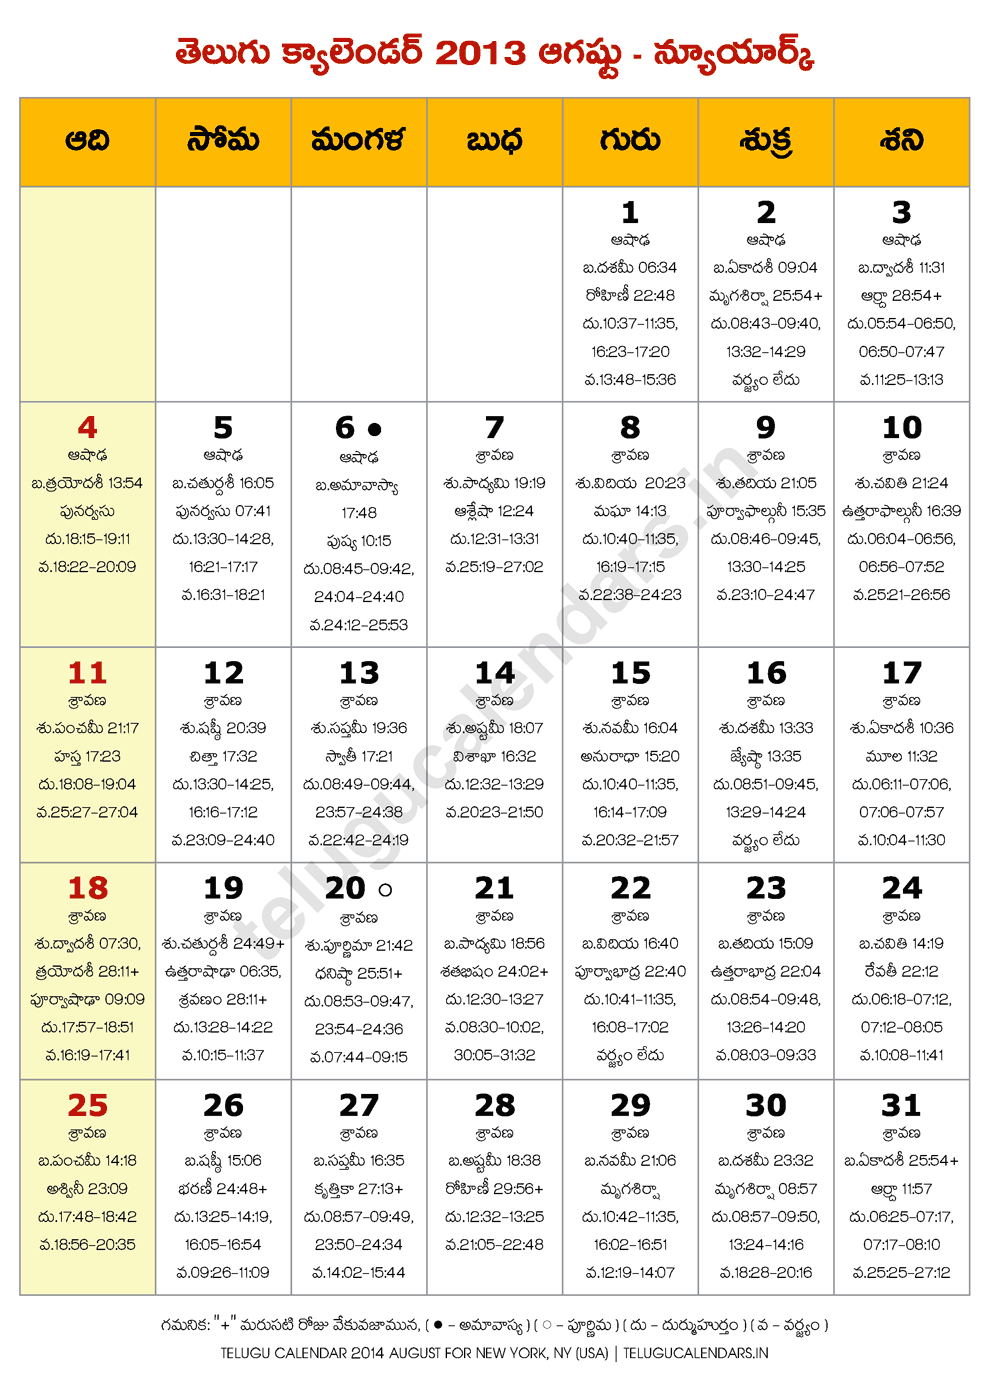 Calendar New York April : August new york telugu calendar pdf in